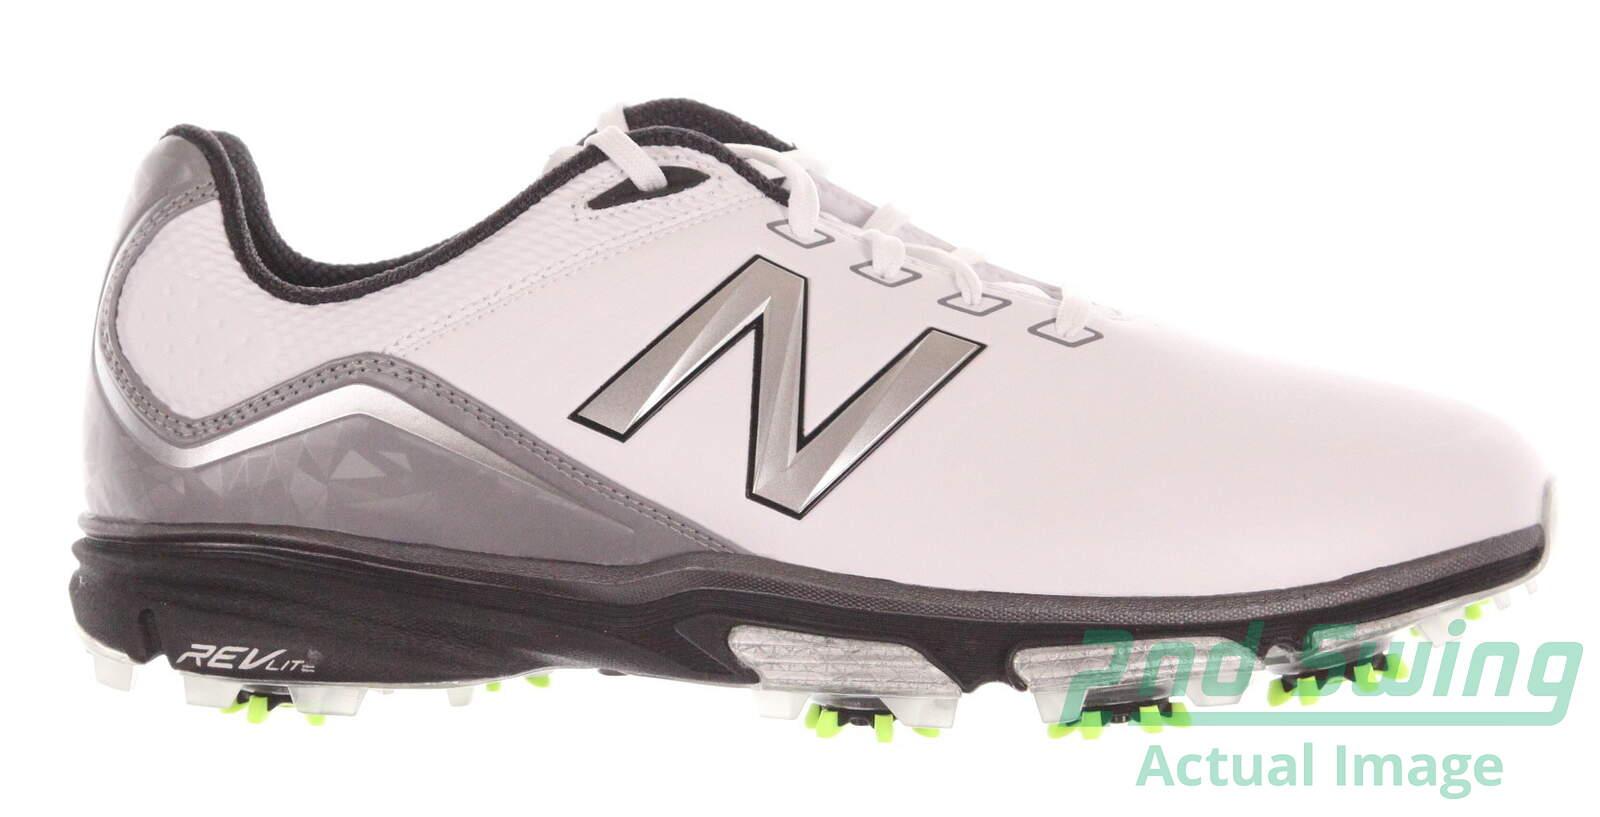 official photos 33ef7 34265 New Mens Golf Shoe New Balance 3001 Medium 10.5 White MSRP  190 NBG3001 -  Golf Footwear